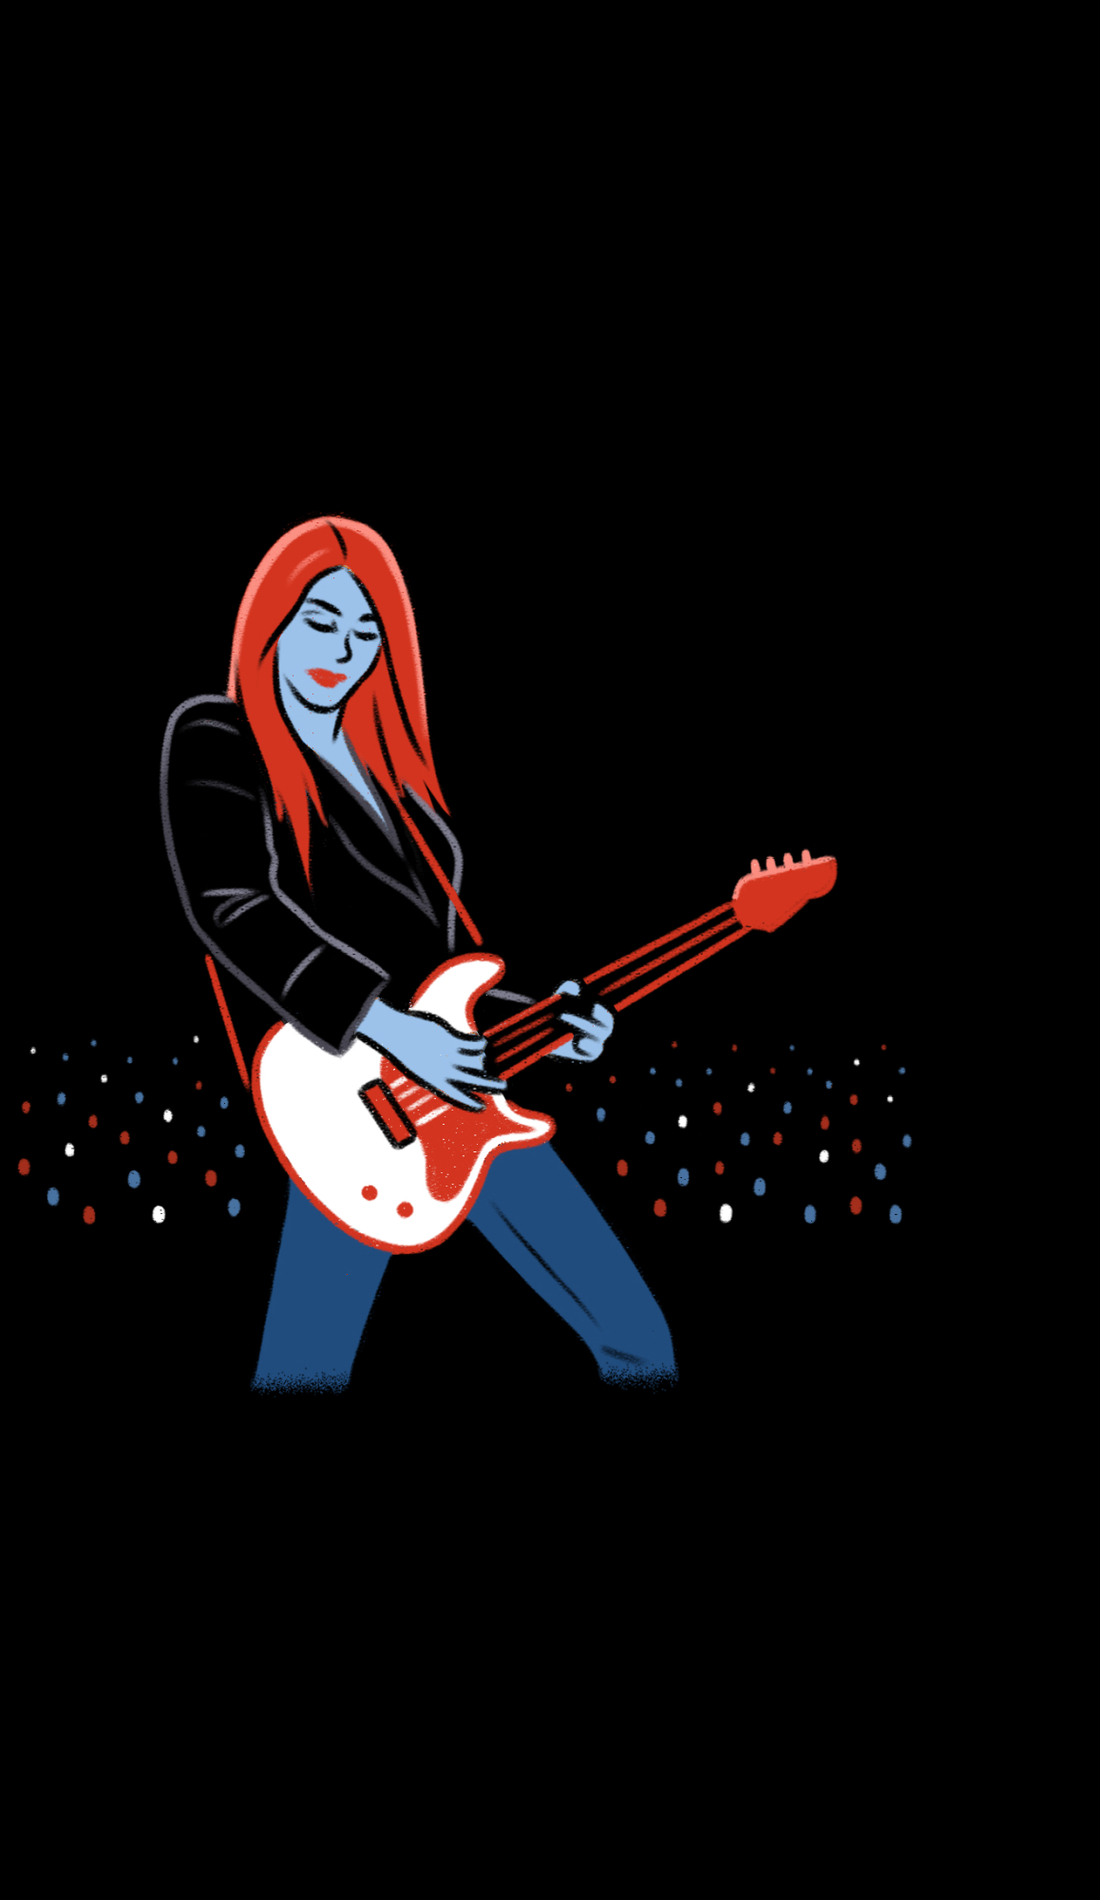 A Smokey Brights live event